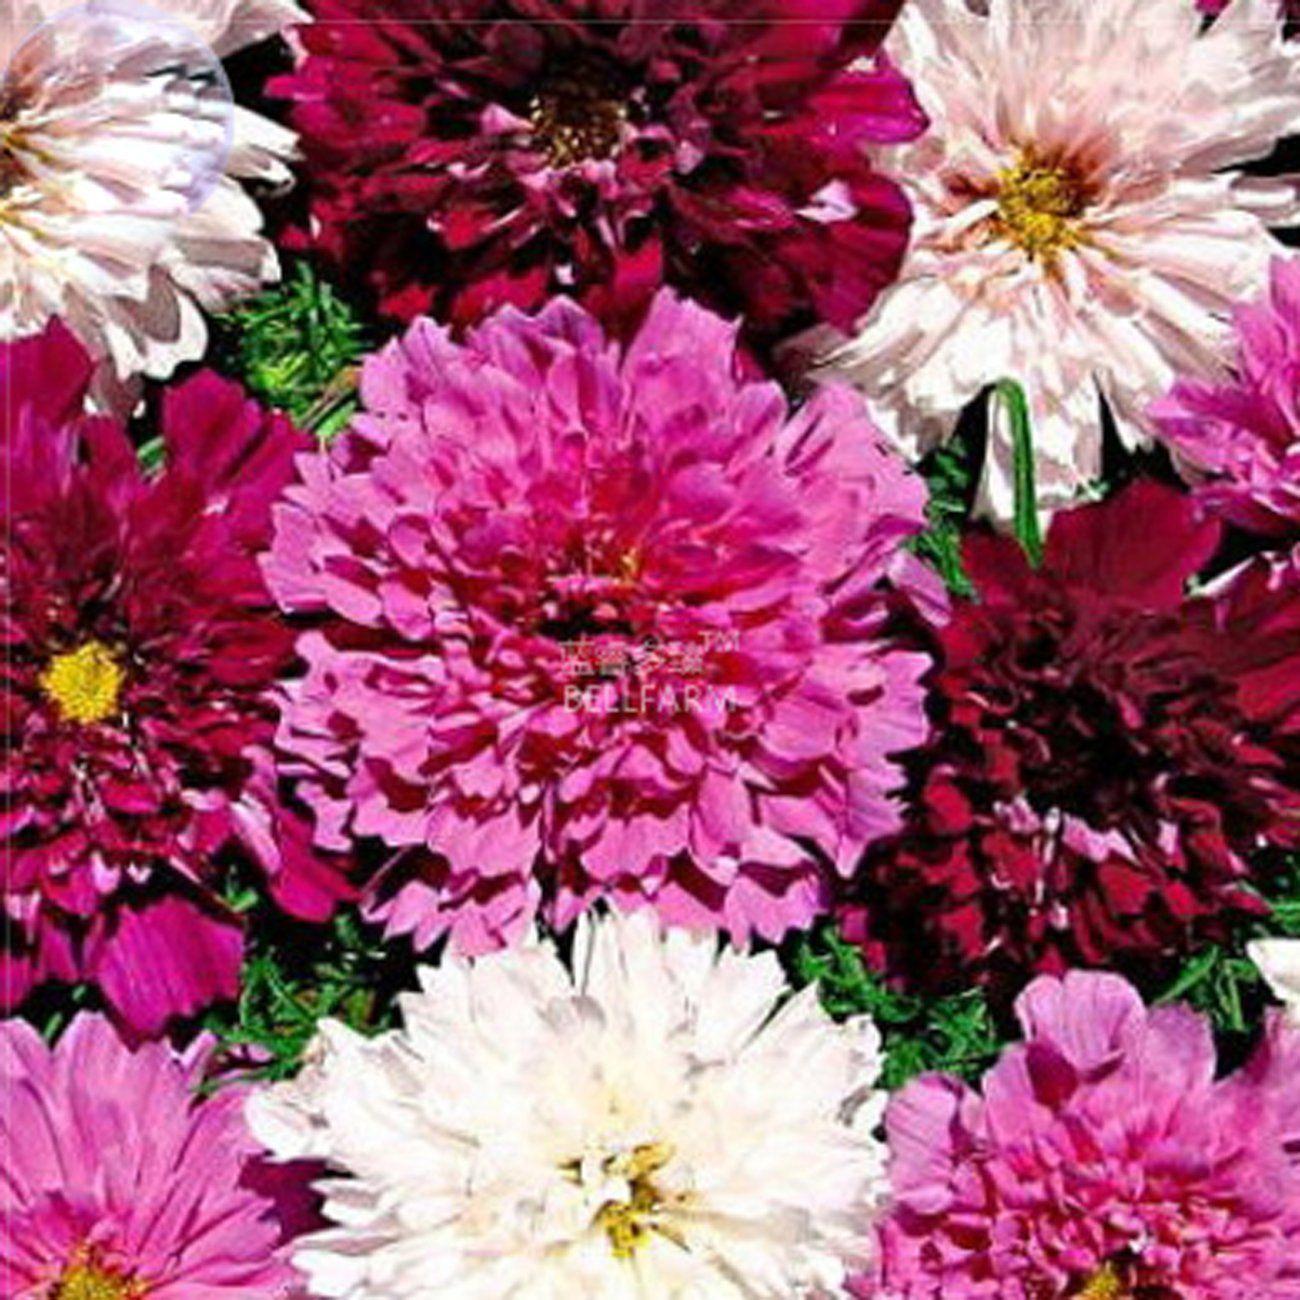 Amazon best garden seeds rare cosmos coreopsis double petals amazon best garden seeds rare cosmos coreopsis double petals dark red white pink izmirmasajfo